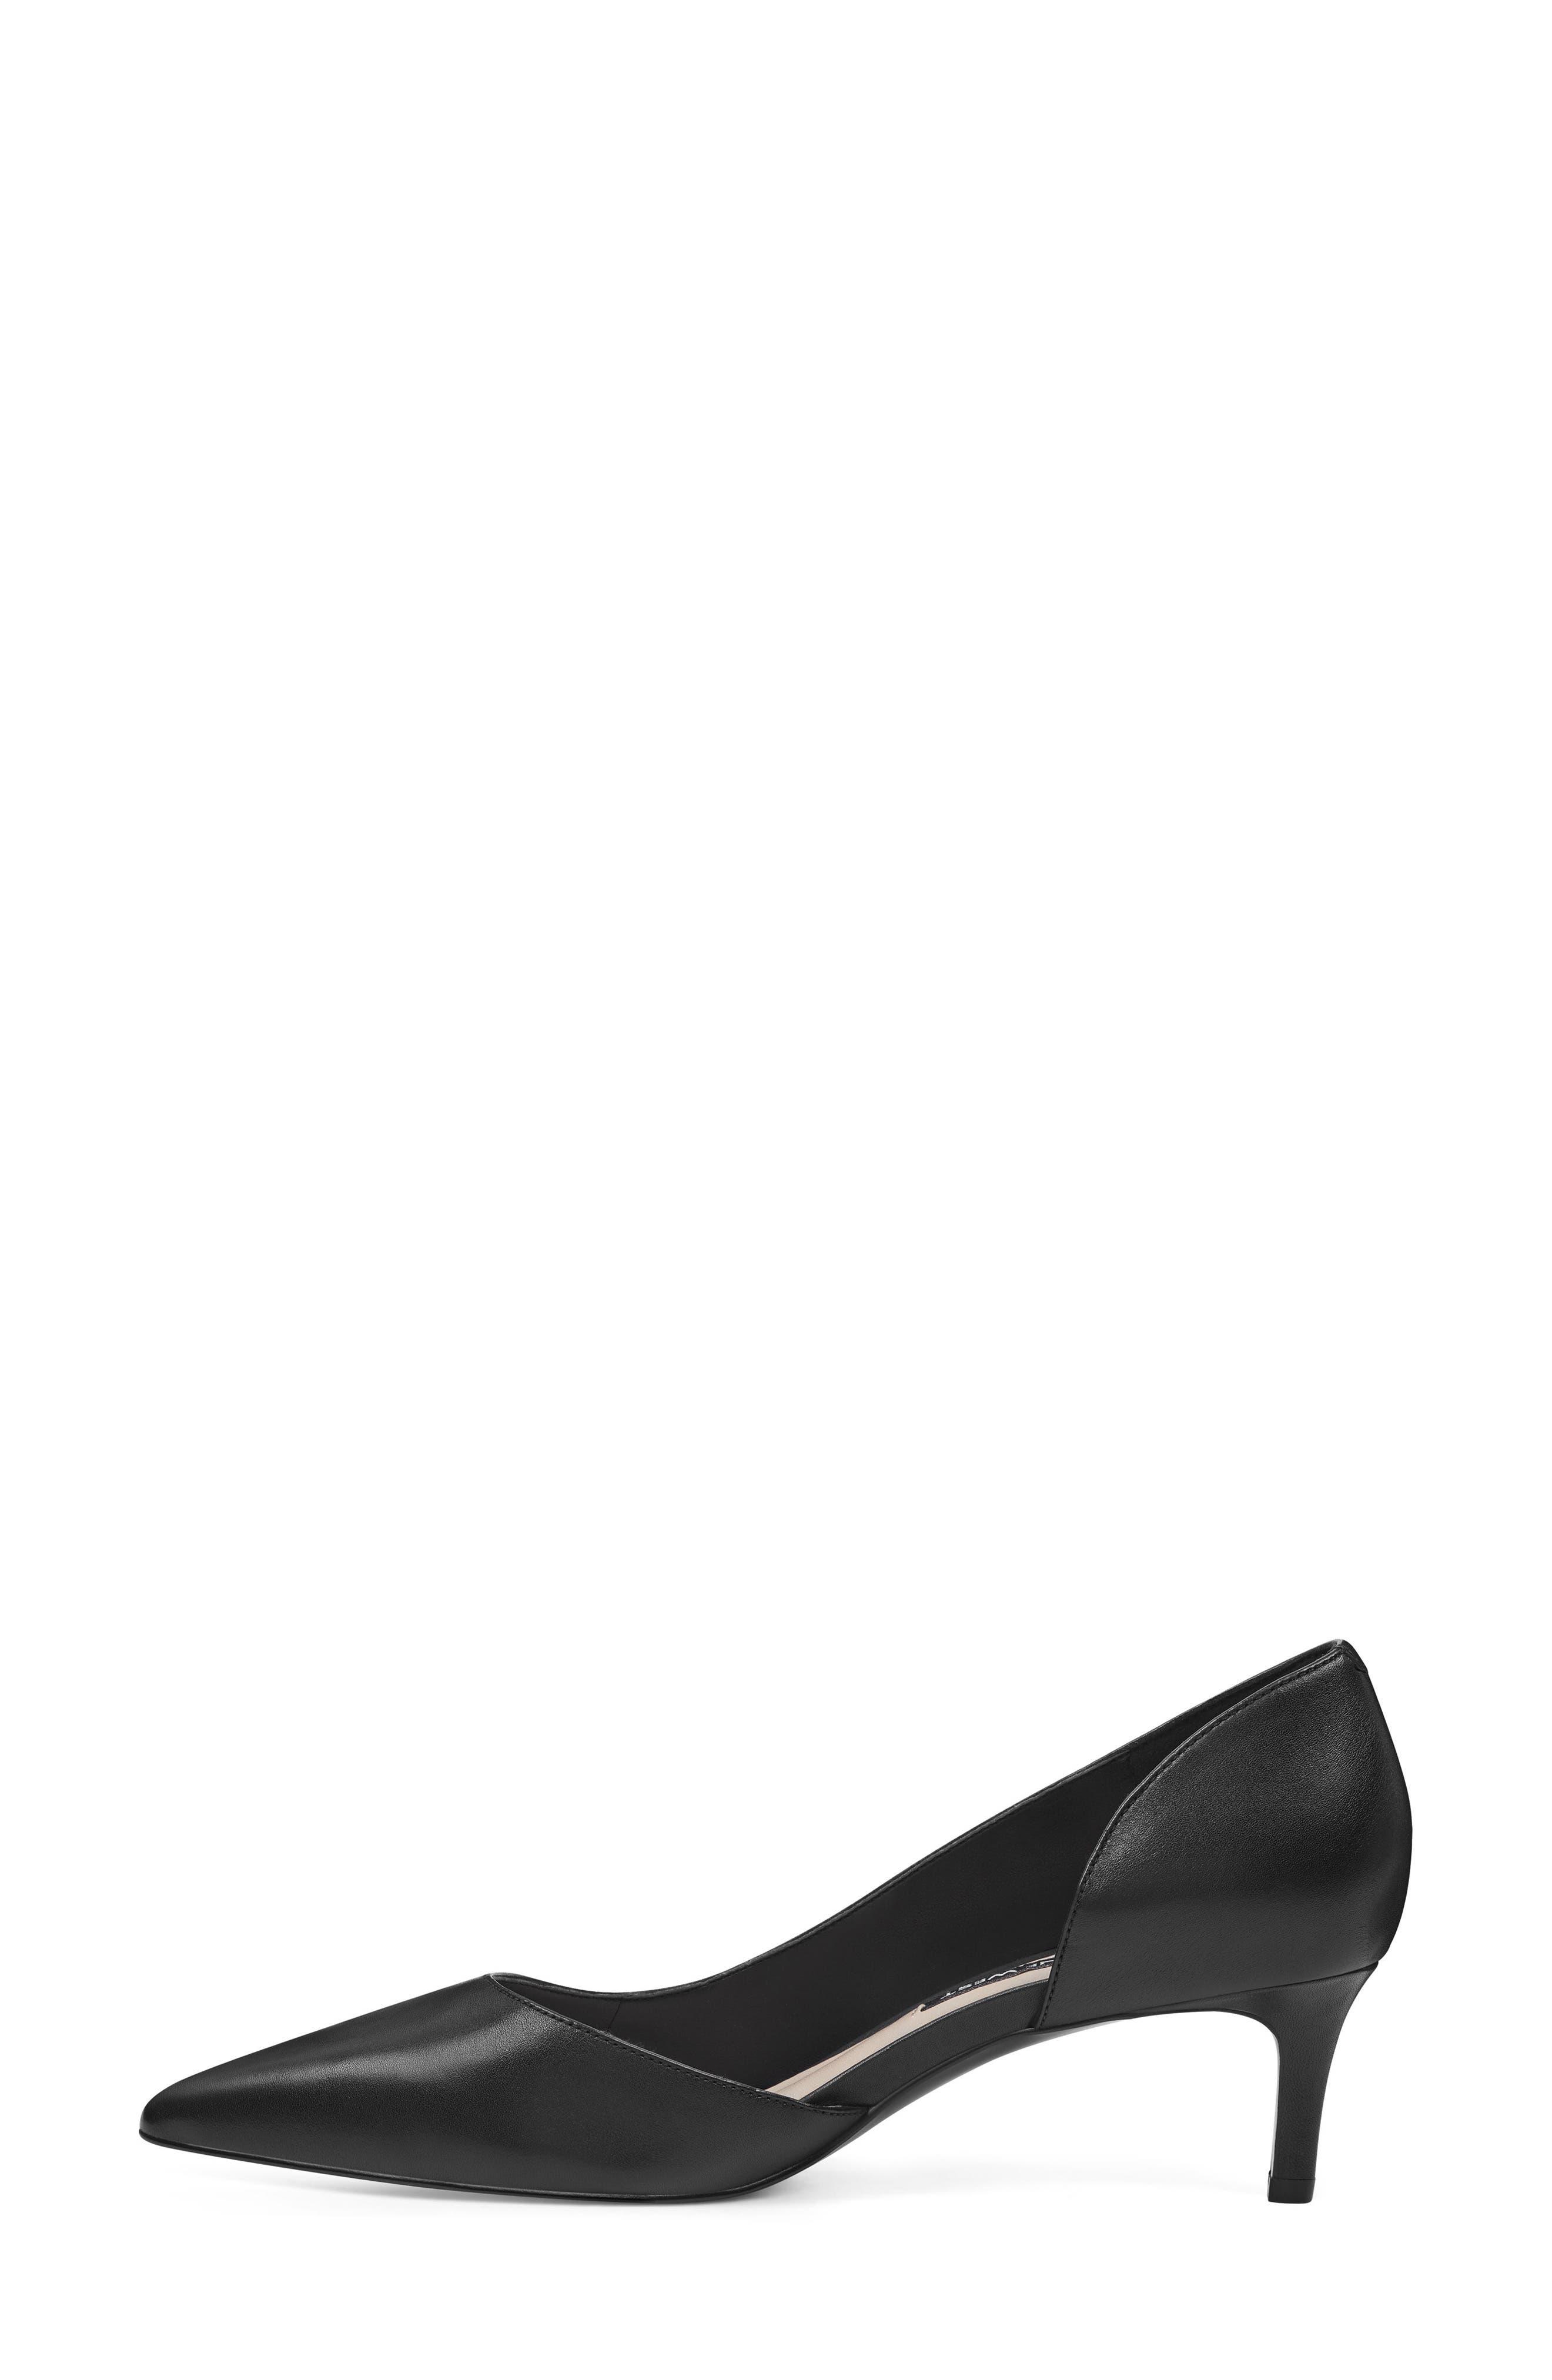 Fiacre Half d'Orsay Pump,                             Alternate thumbnail 10, color,                             BLACK LEATHER